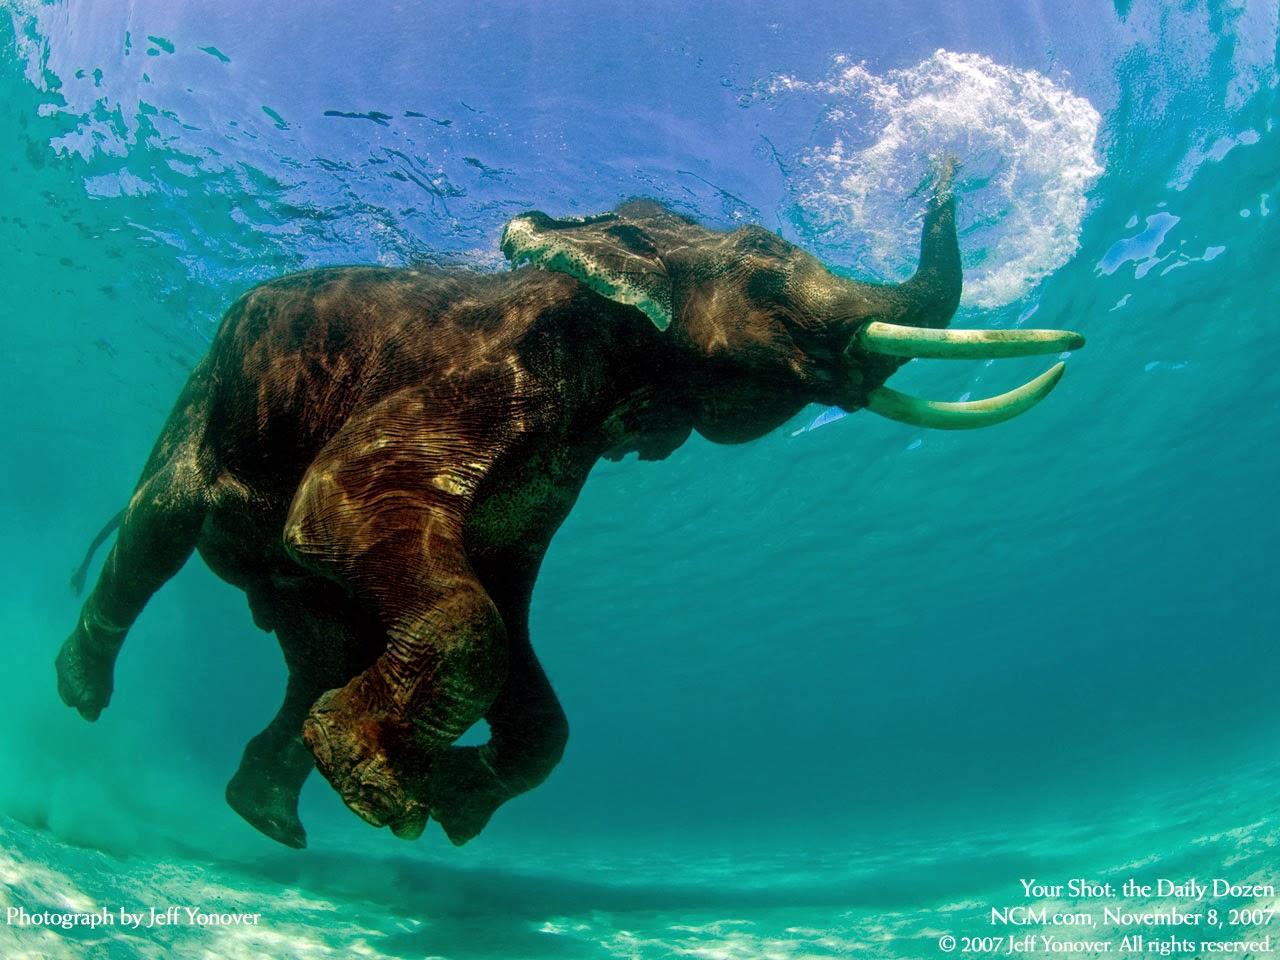 Animals Diving Underwater - Wallpapers HD - Tapandaola111